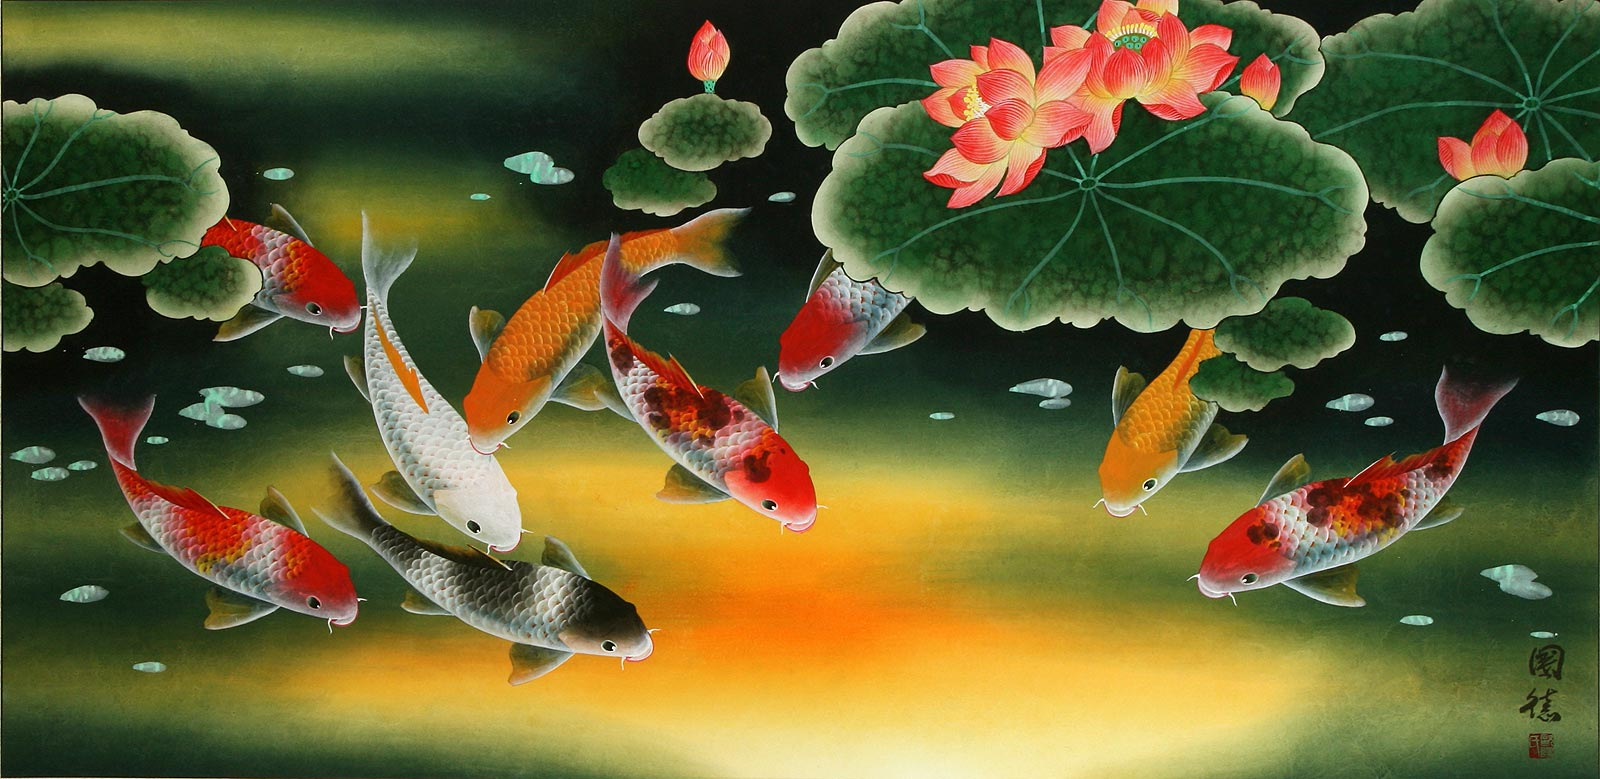 Huge Koi Fish and Lily Chinese Art Painting - Asian Koi Fish ...